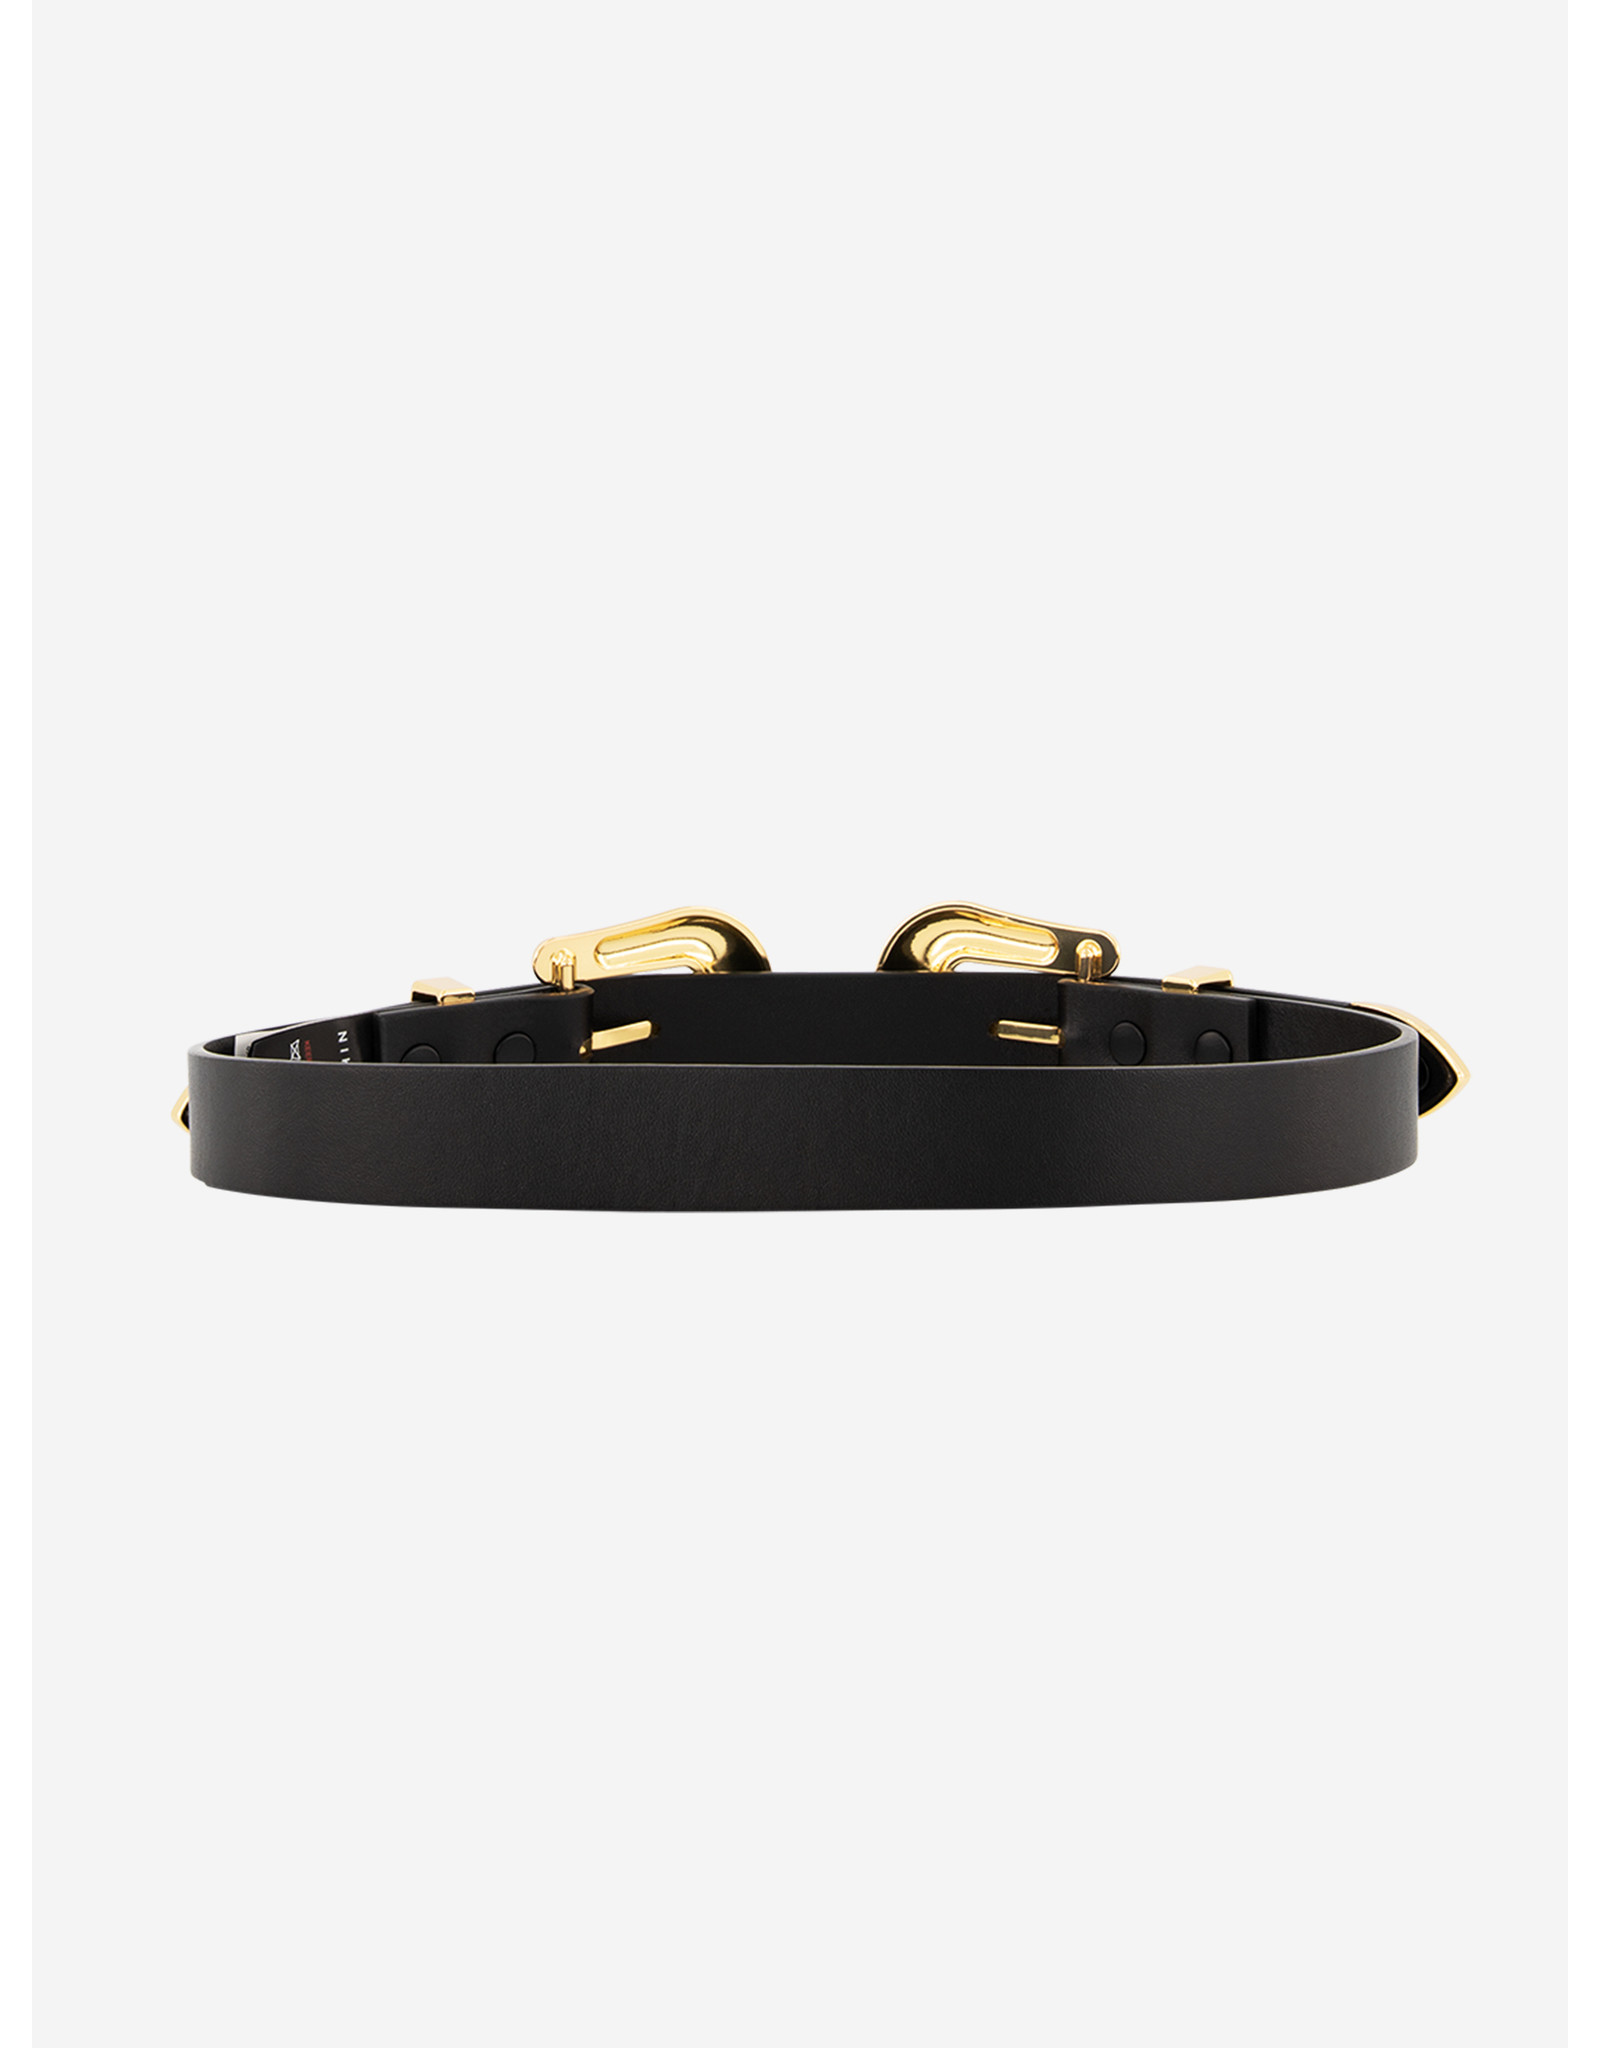 Nik & Nik Bia 2-Buckle Belt Black/Gold